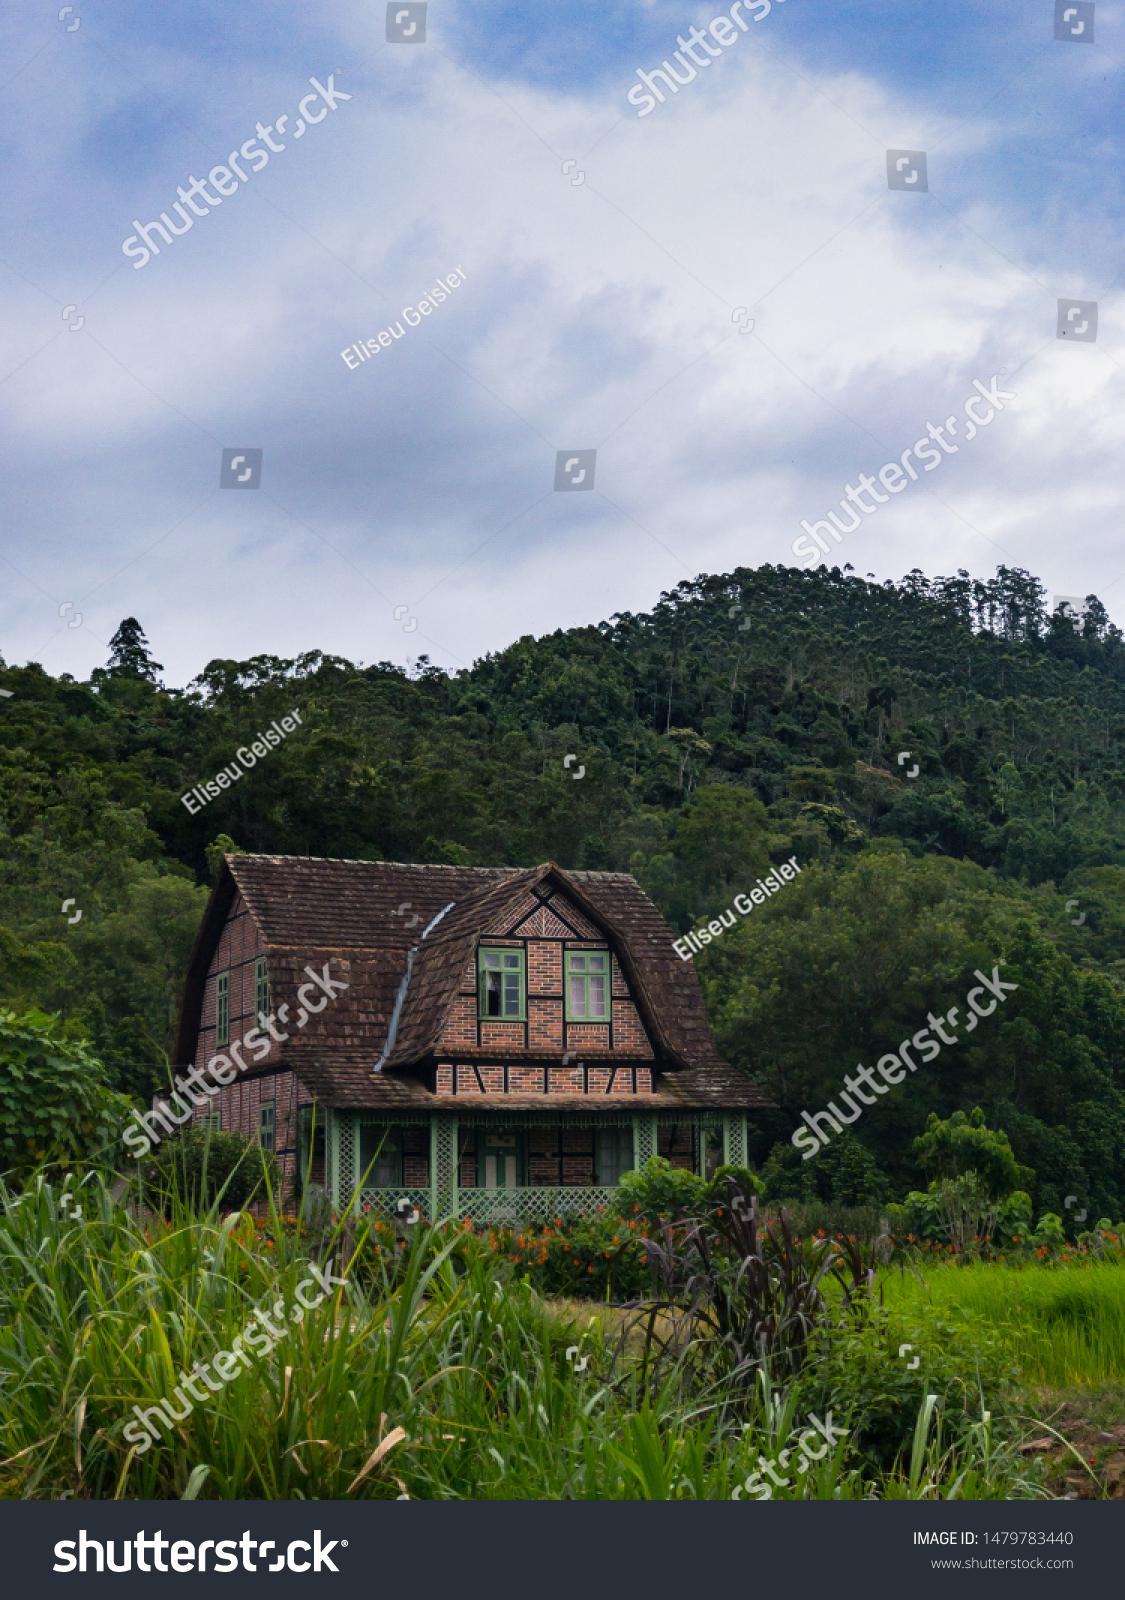 German Colonial House : german, colonial, house, Colonial, German, House, South, Brazil, Stock, Photo, (Edit, 1479783440